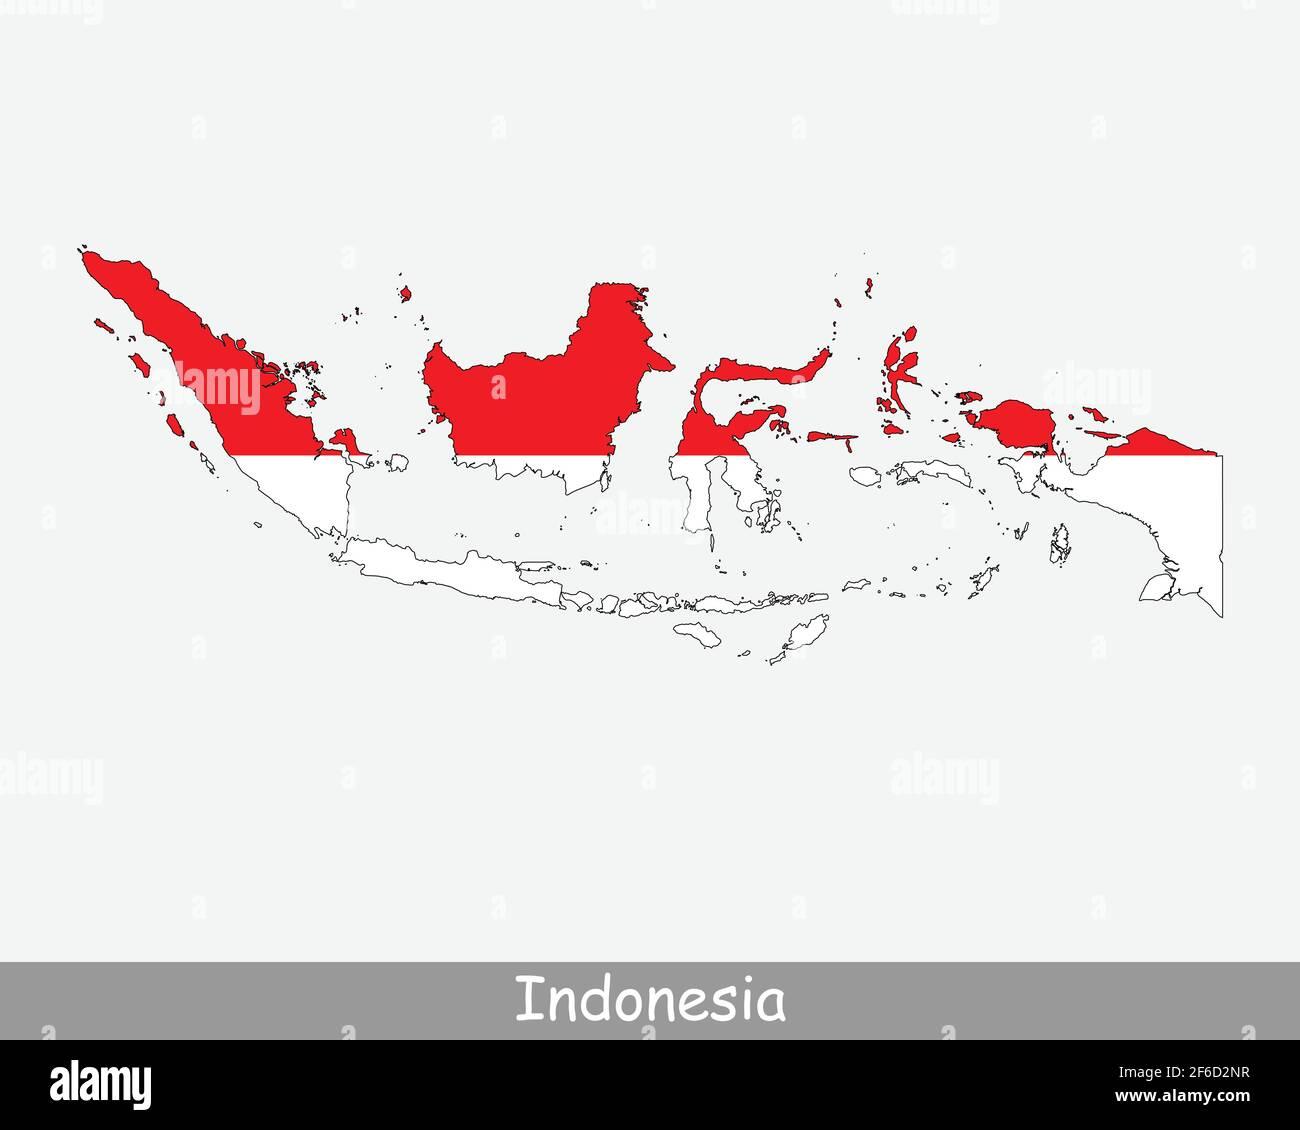 Cartina Indonesia Dettagliata.Jakarta Map Immagini E Fotos Stock Alamy